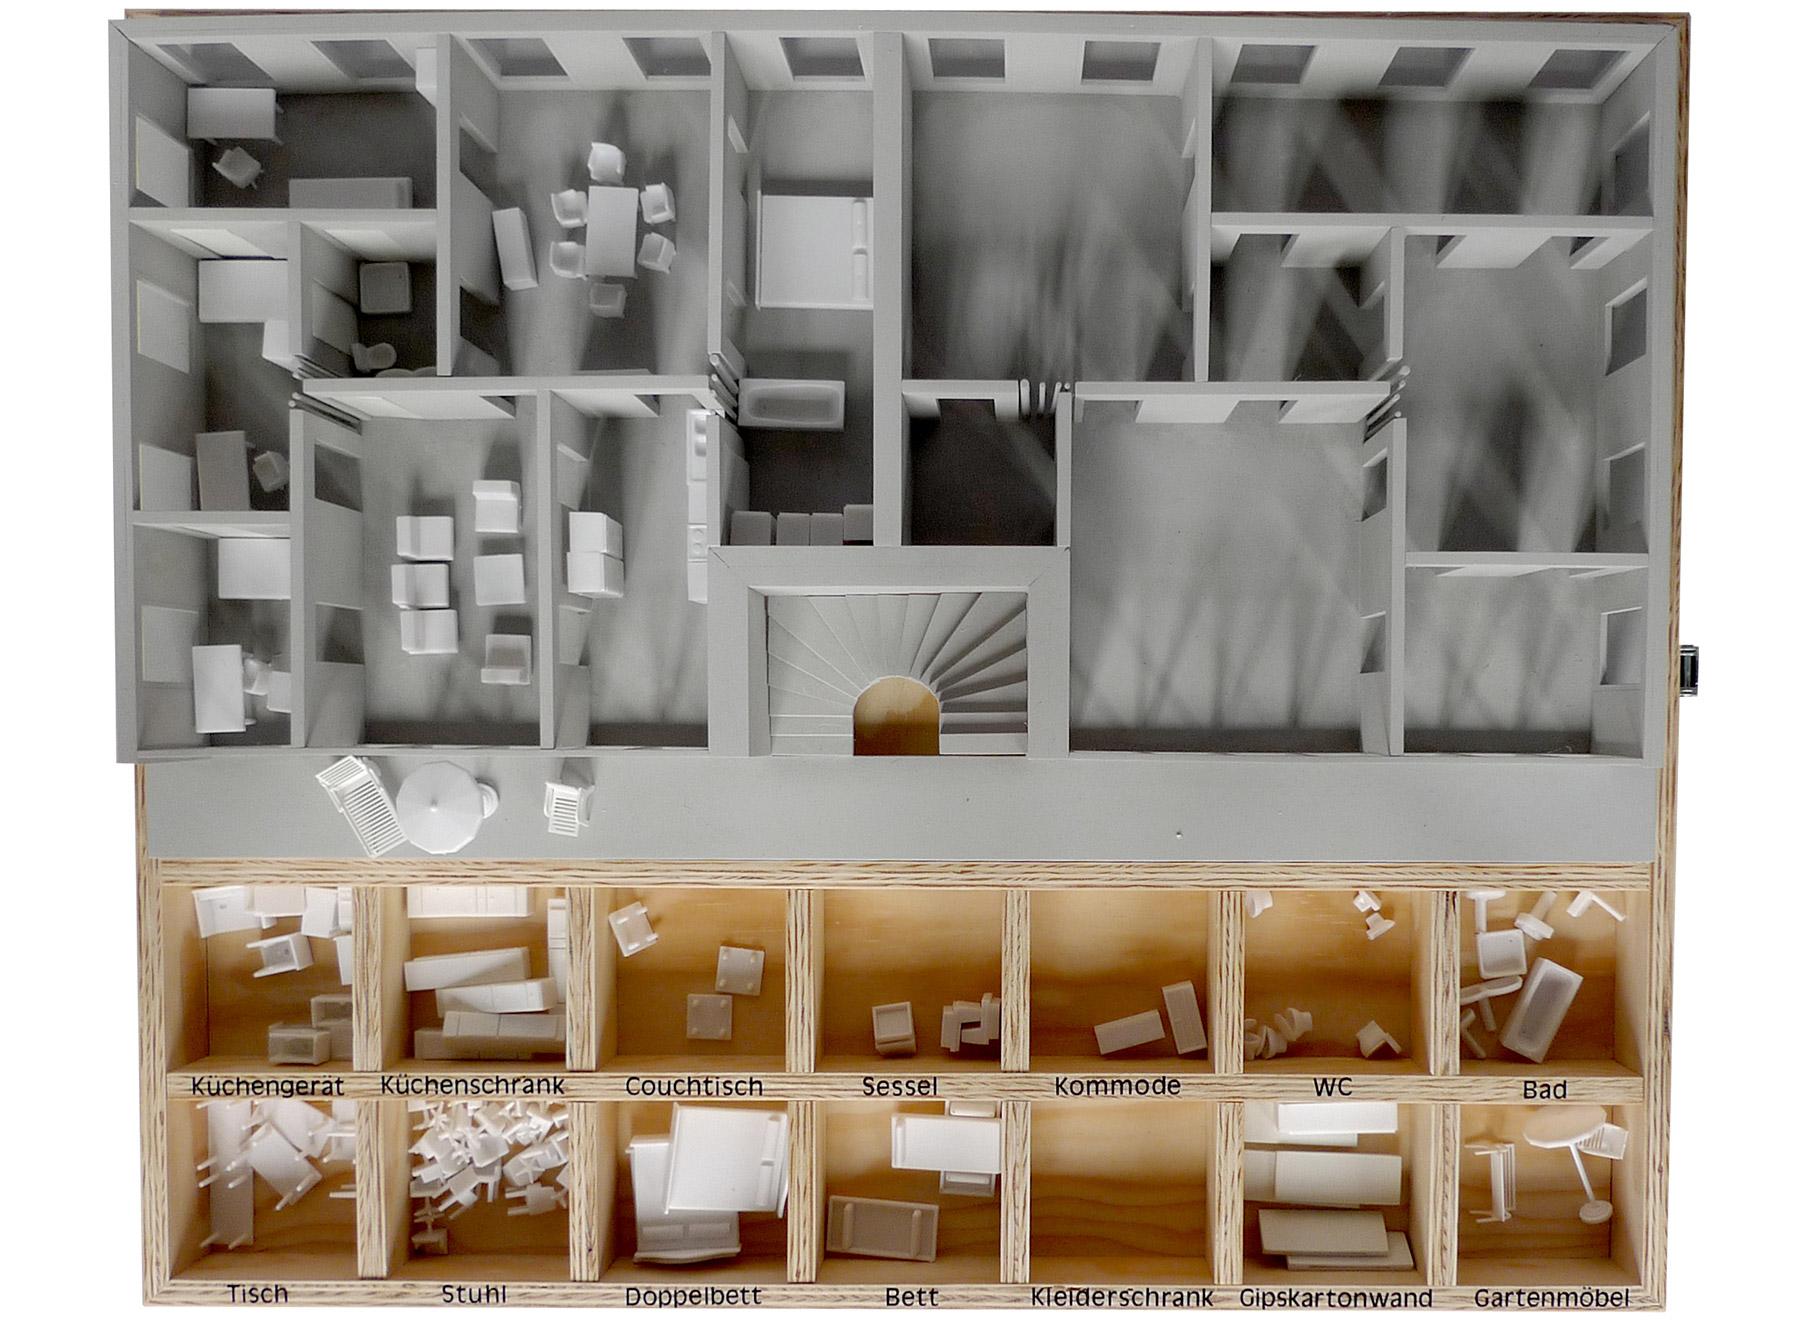 configuration model of neutral floor plan